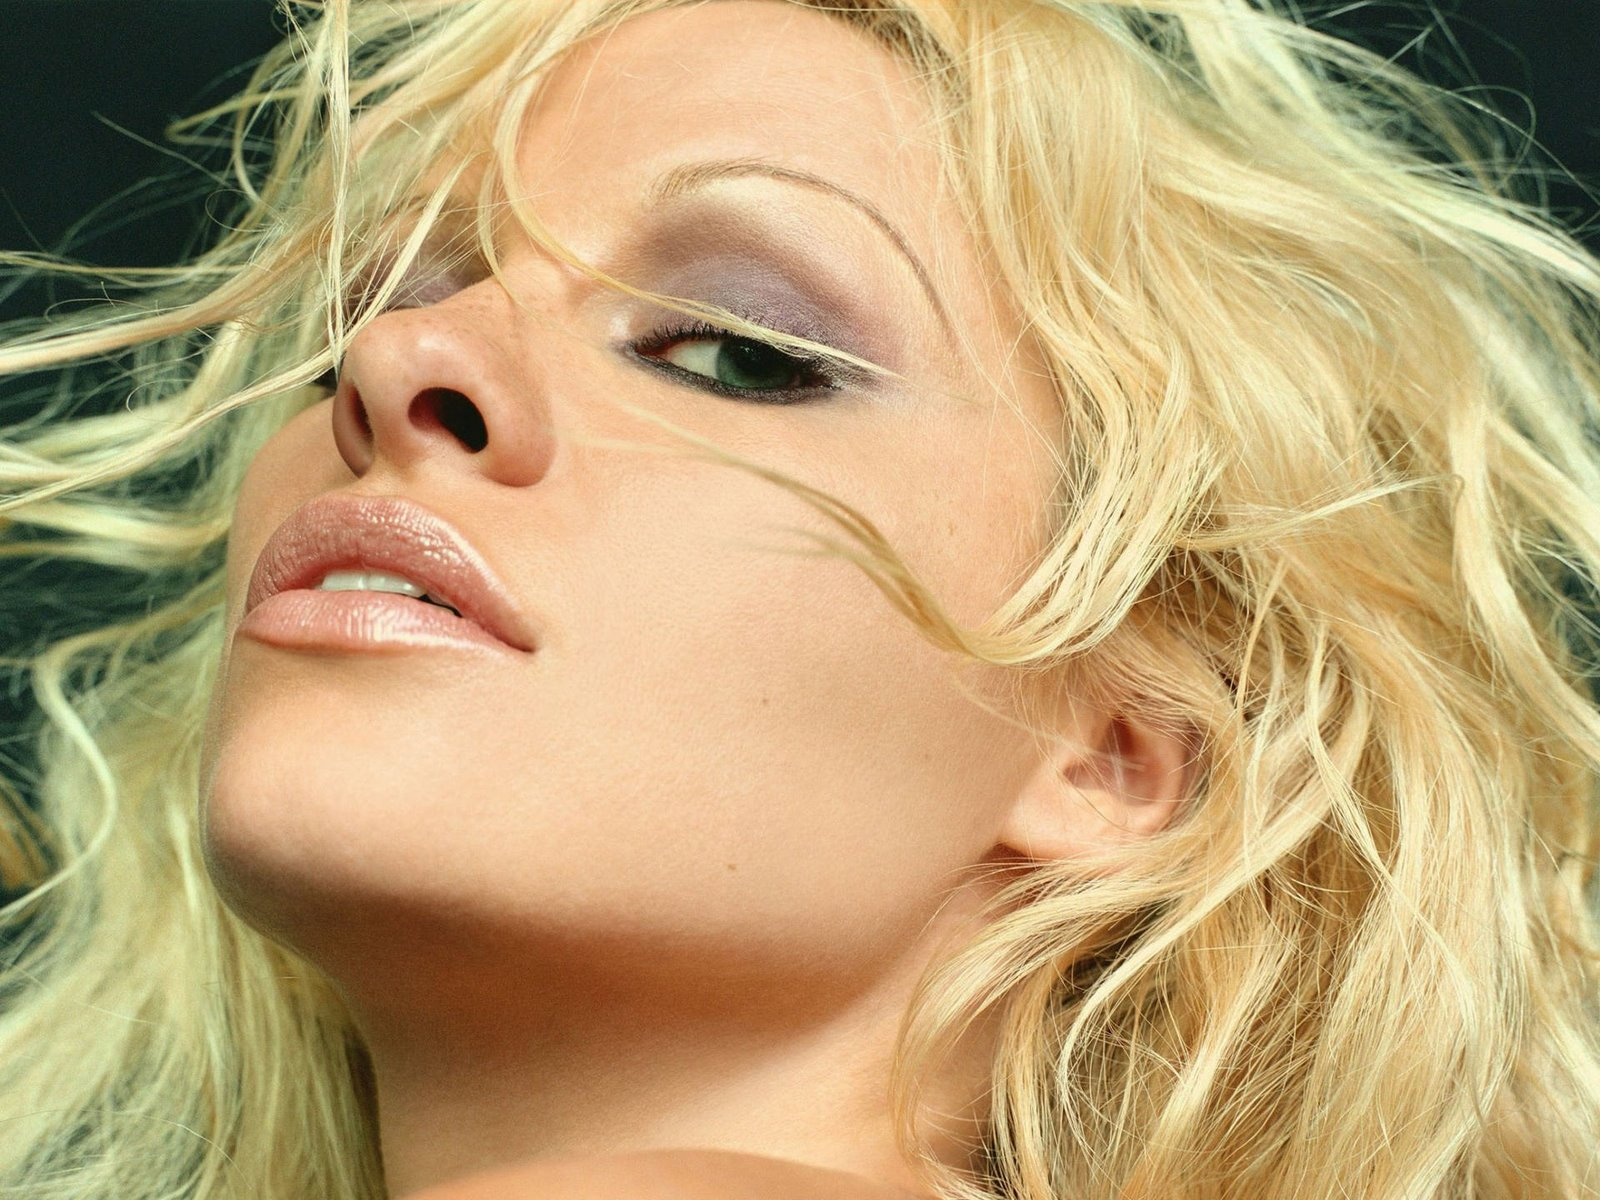 Pamela Anderson Hot Wallpapers Free Download Bikinisexy -4052